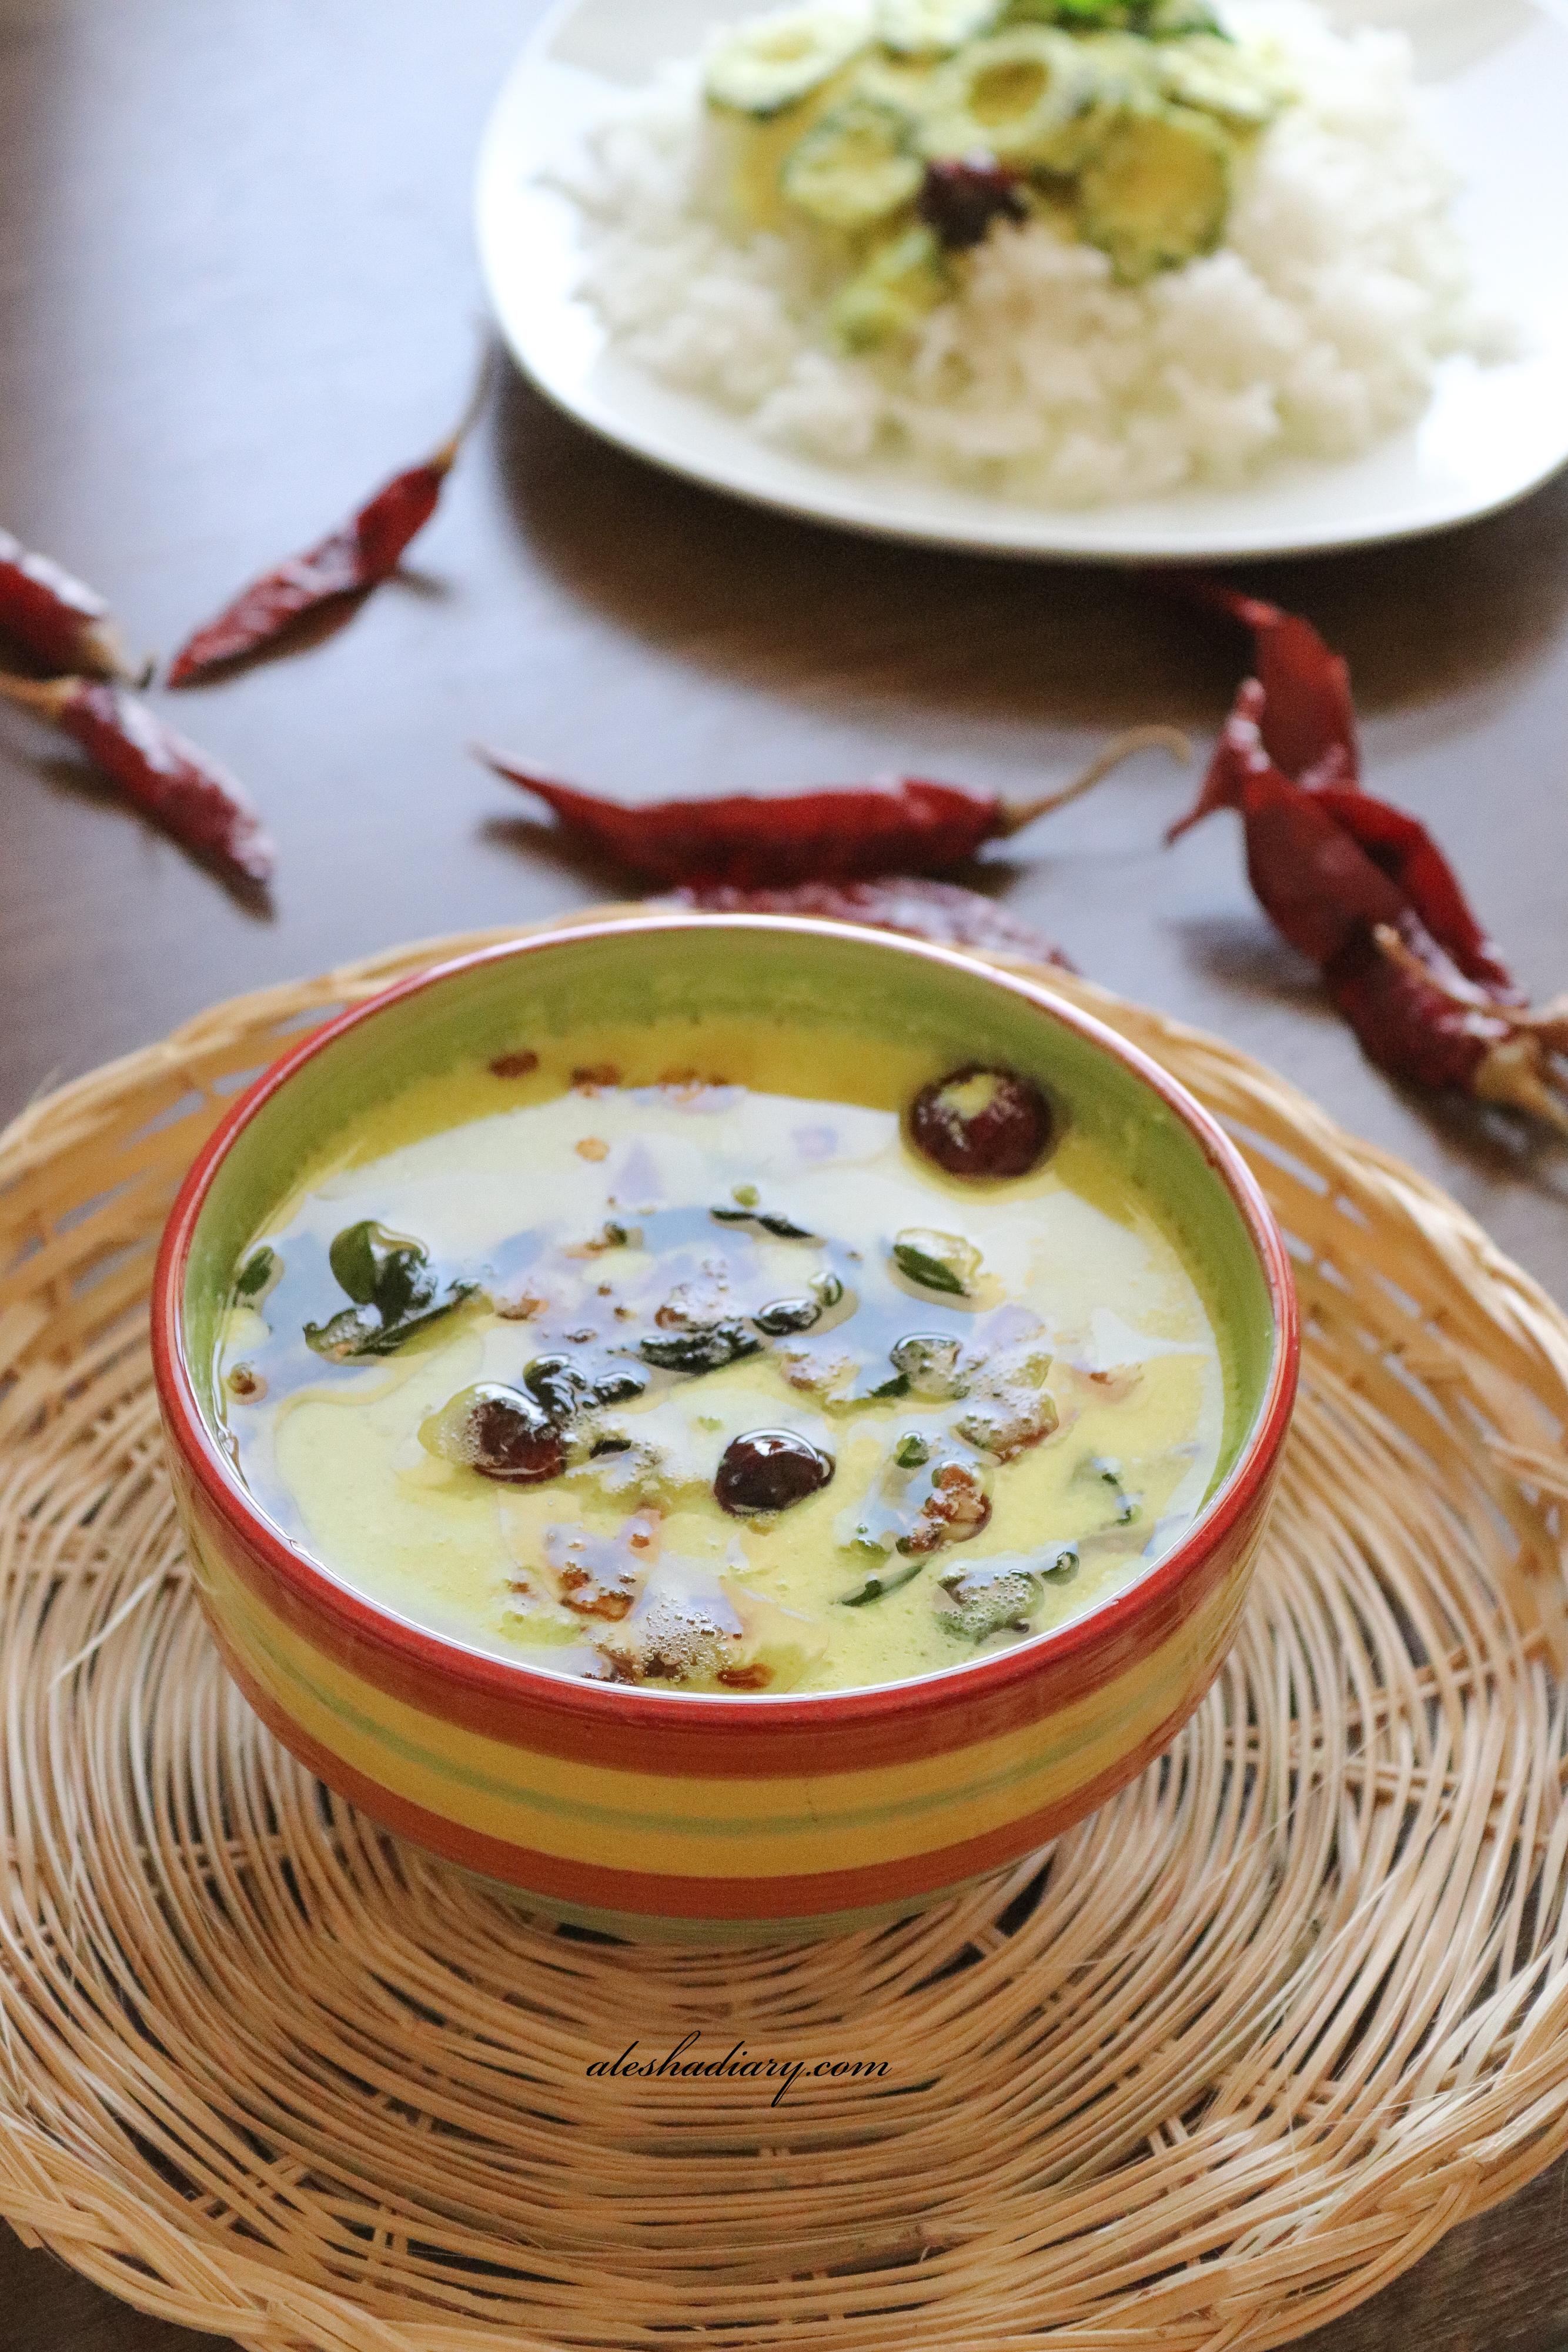 Pavakkai(Pagarkai) mor kuzhambu – Pavakka(Kaipakka) moru curry – Bittergourd yogurt curry